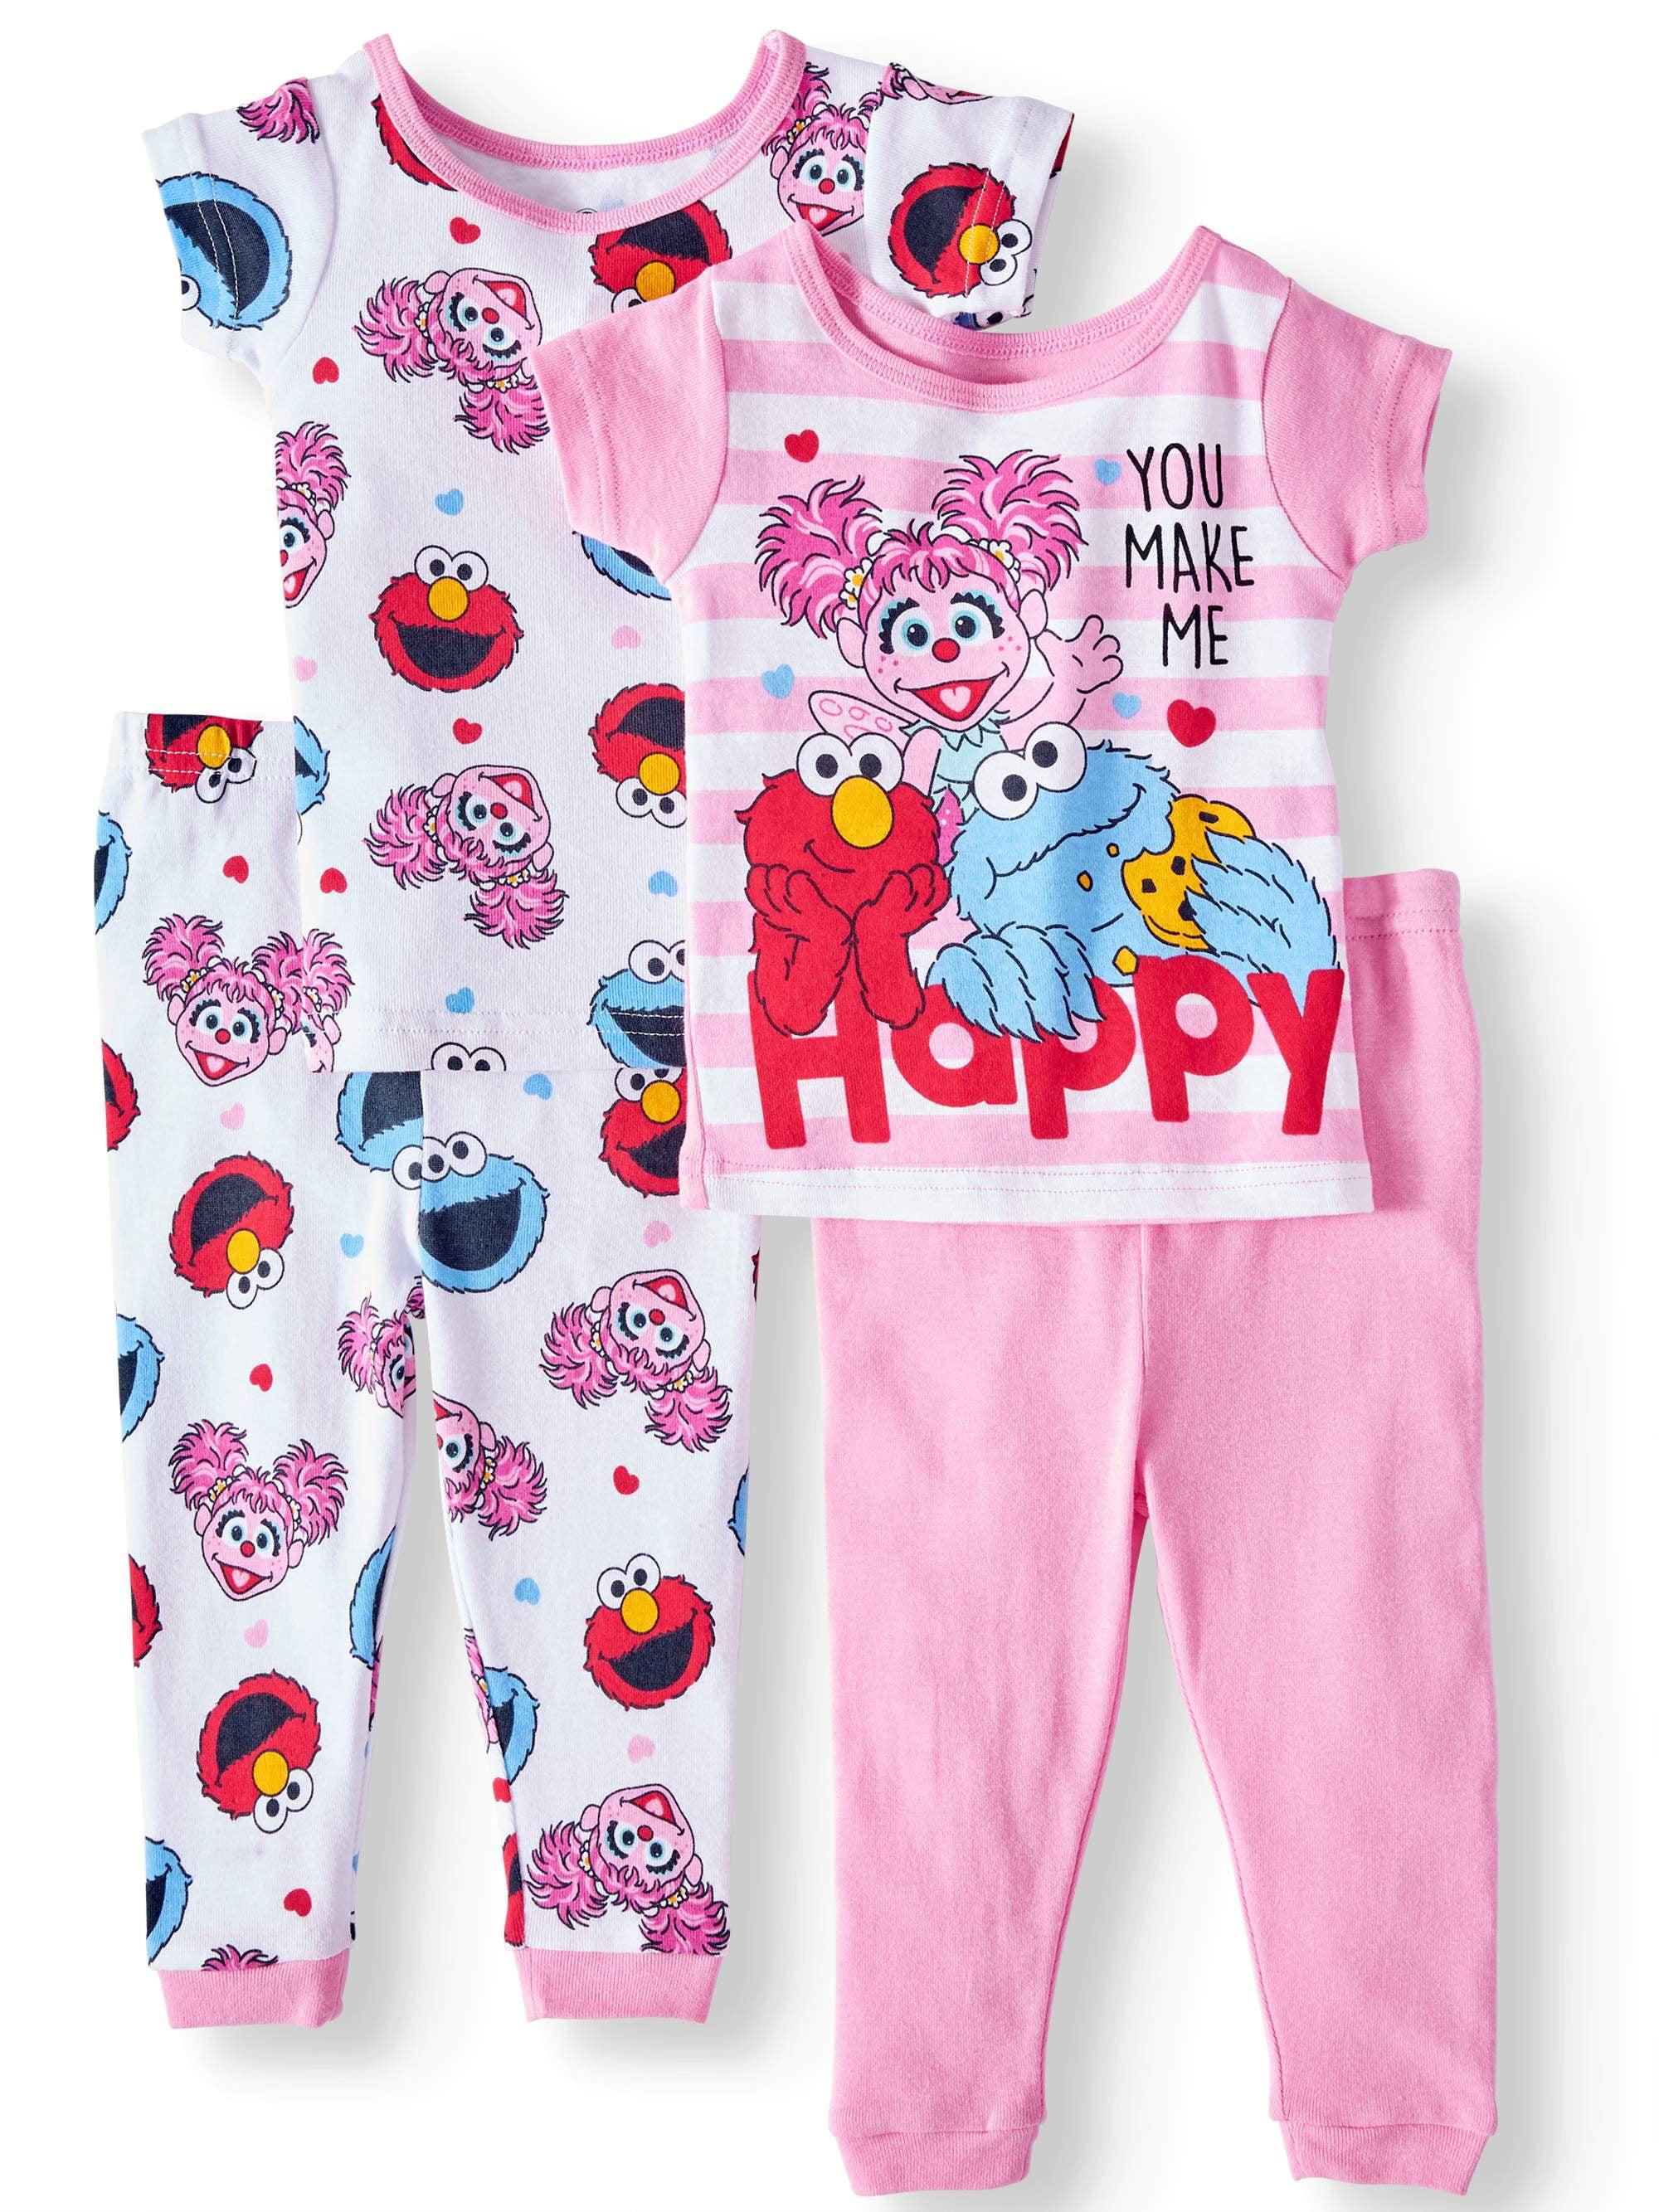 bab9f922e313 Sesame Street - Baby Girls  Cotton Tight Fit Pajamas